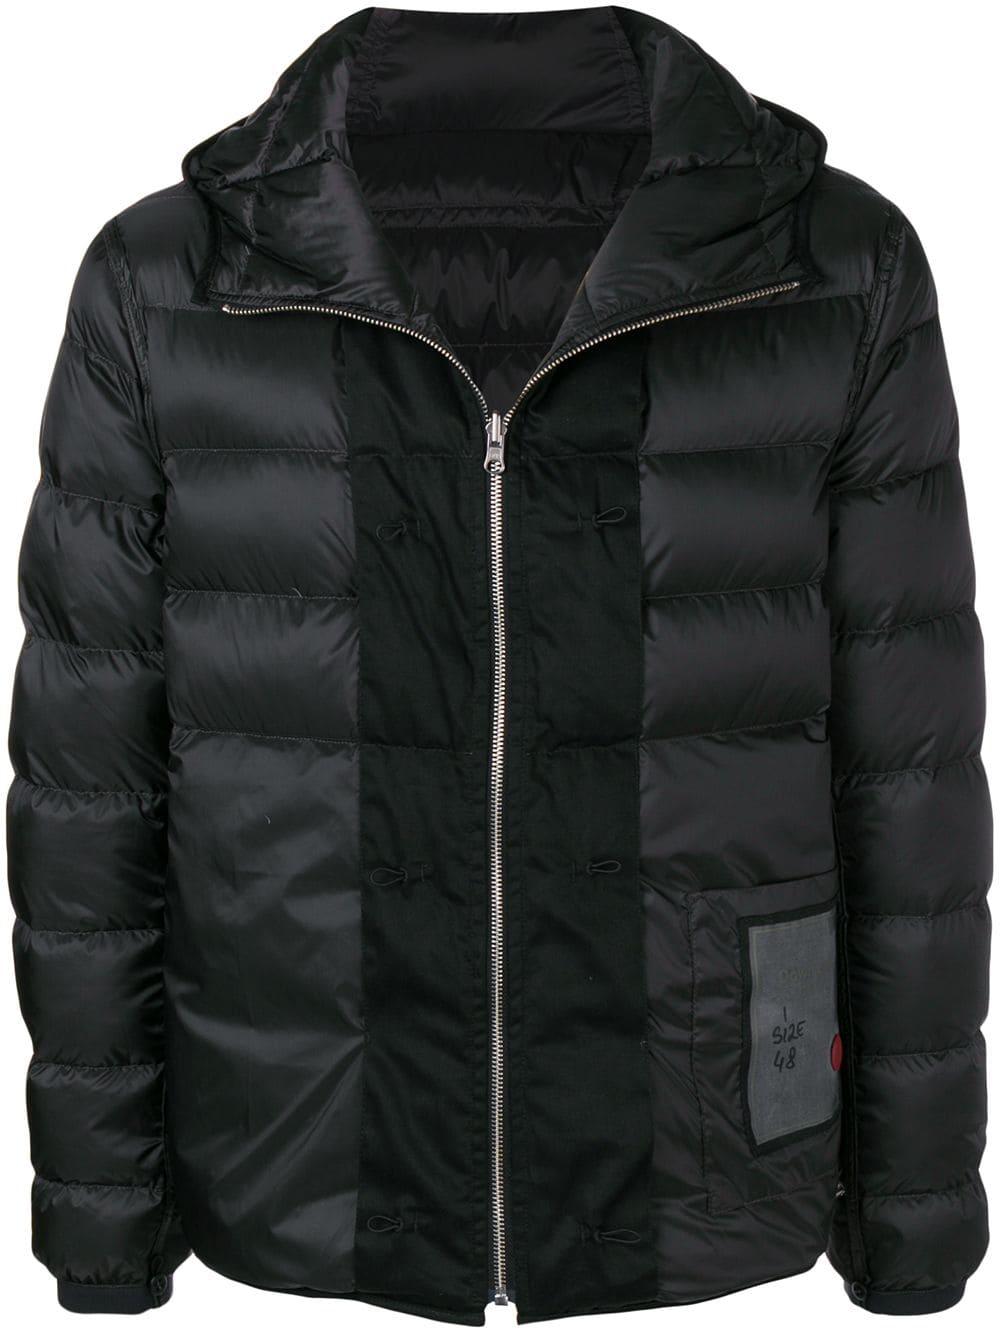 Jacket Hooded Black tenc Ten C cloth Padded tzw5xxq7R